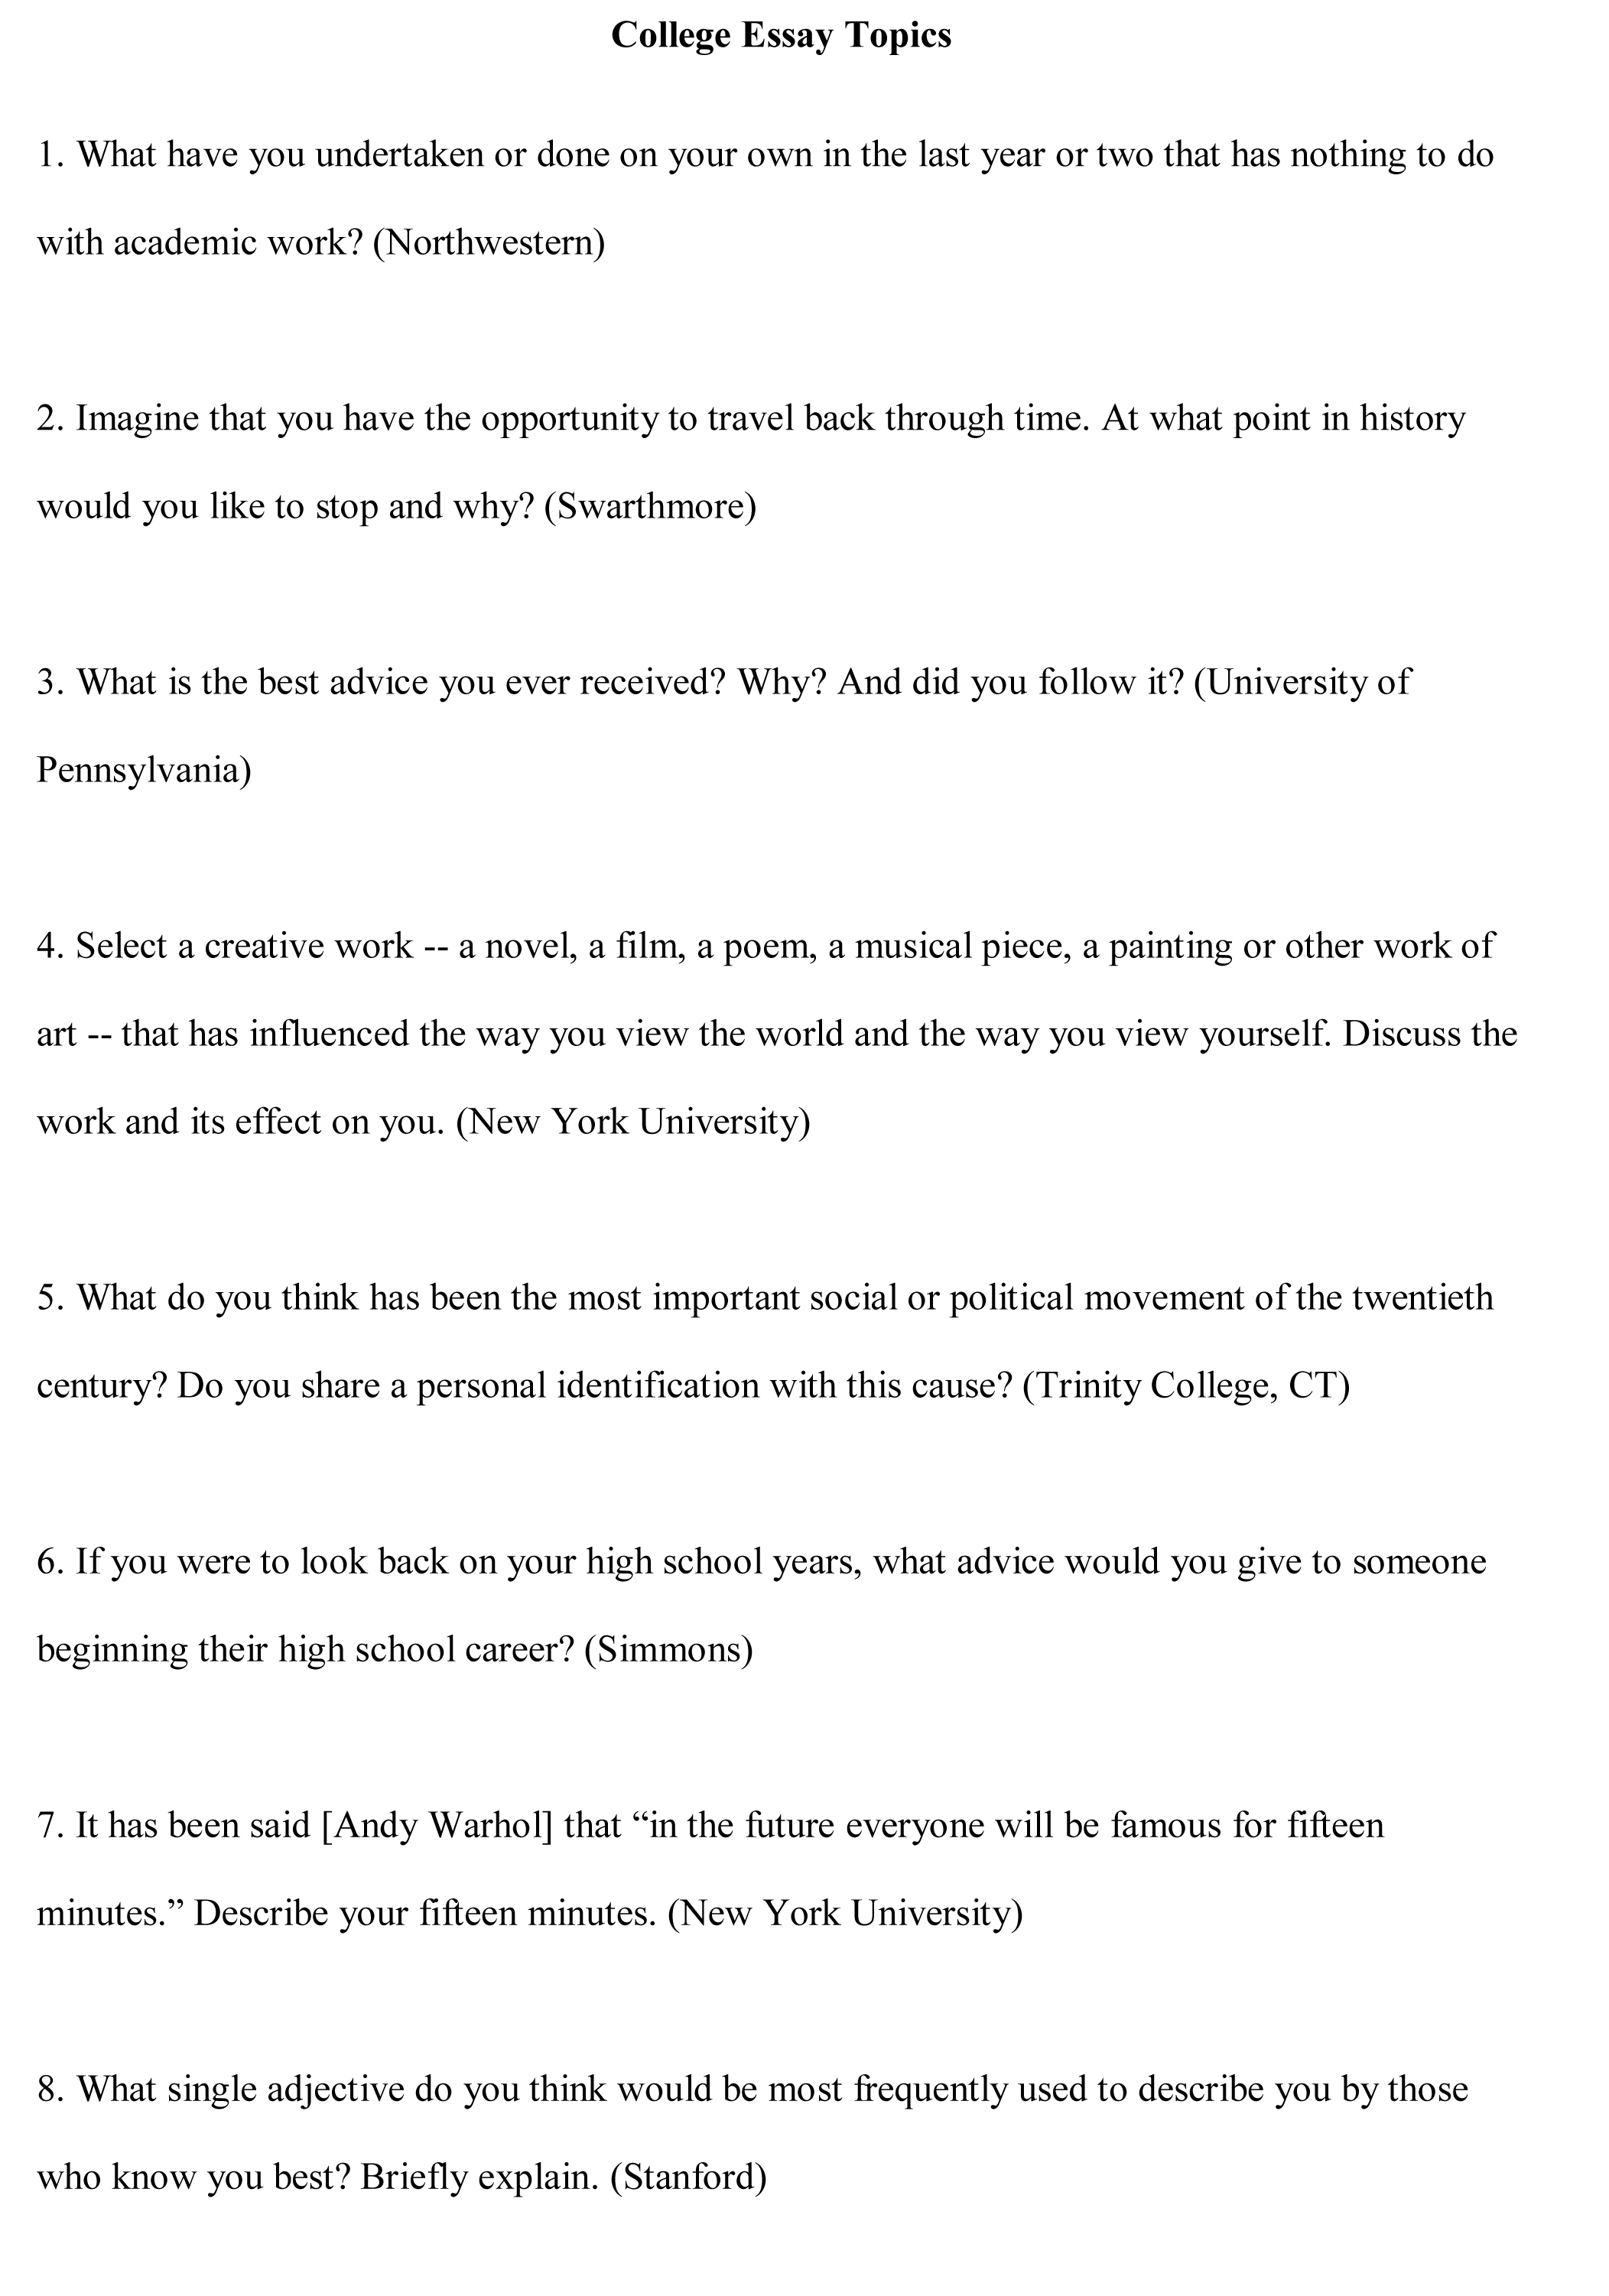 013 English Essay Topics Example College Free Dreaded Literature Question Paper For Class 10 Icse 2015 Maharashtra Board Full